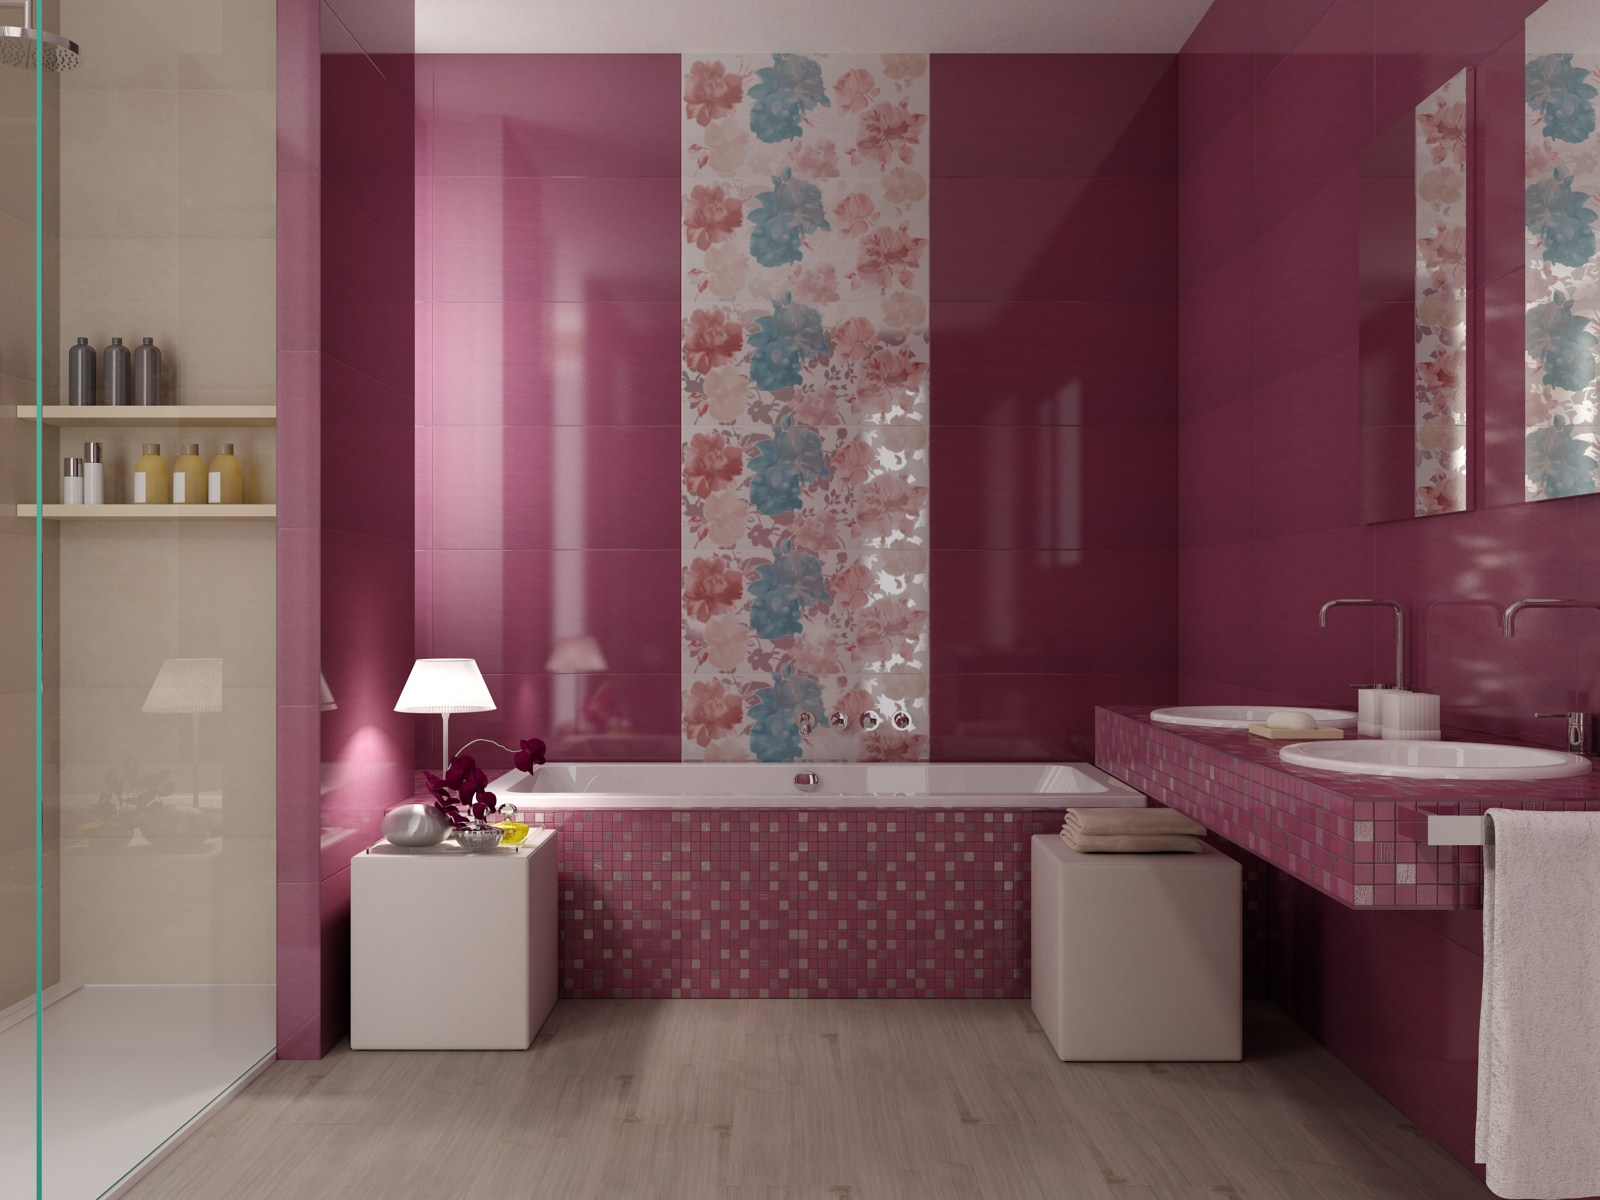 Salle de bain tunisie faience for Devis salle de bain tunisie